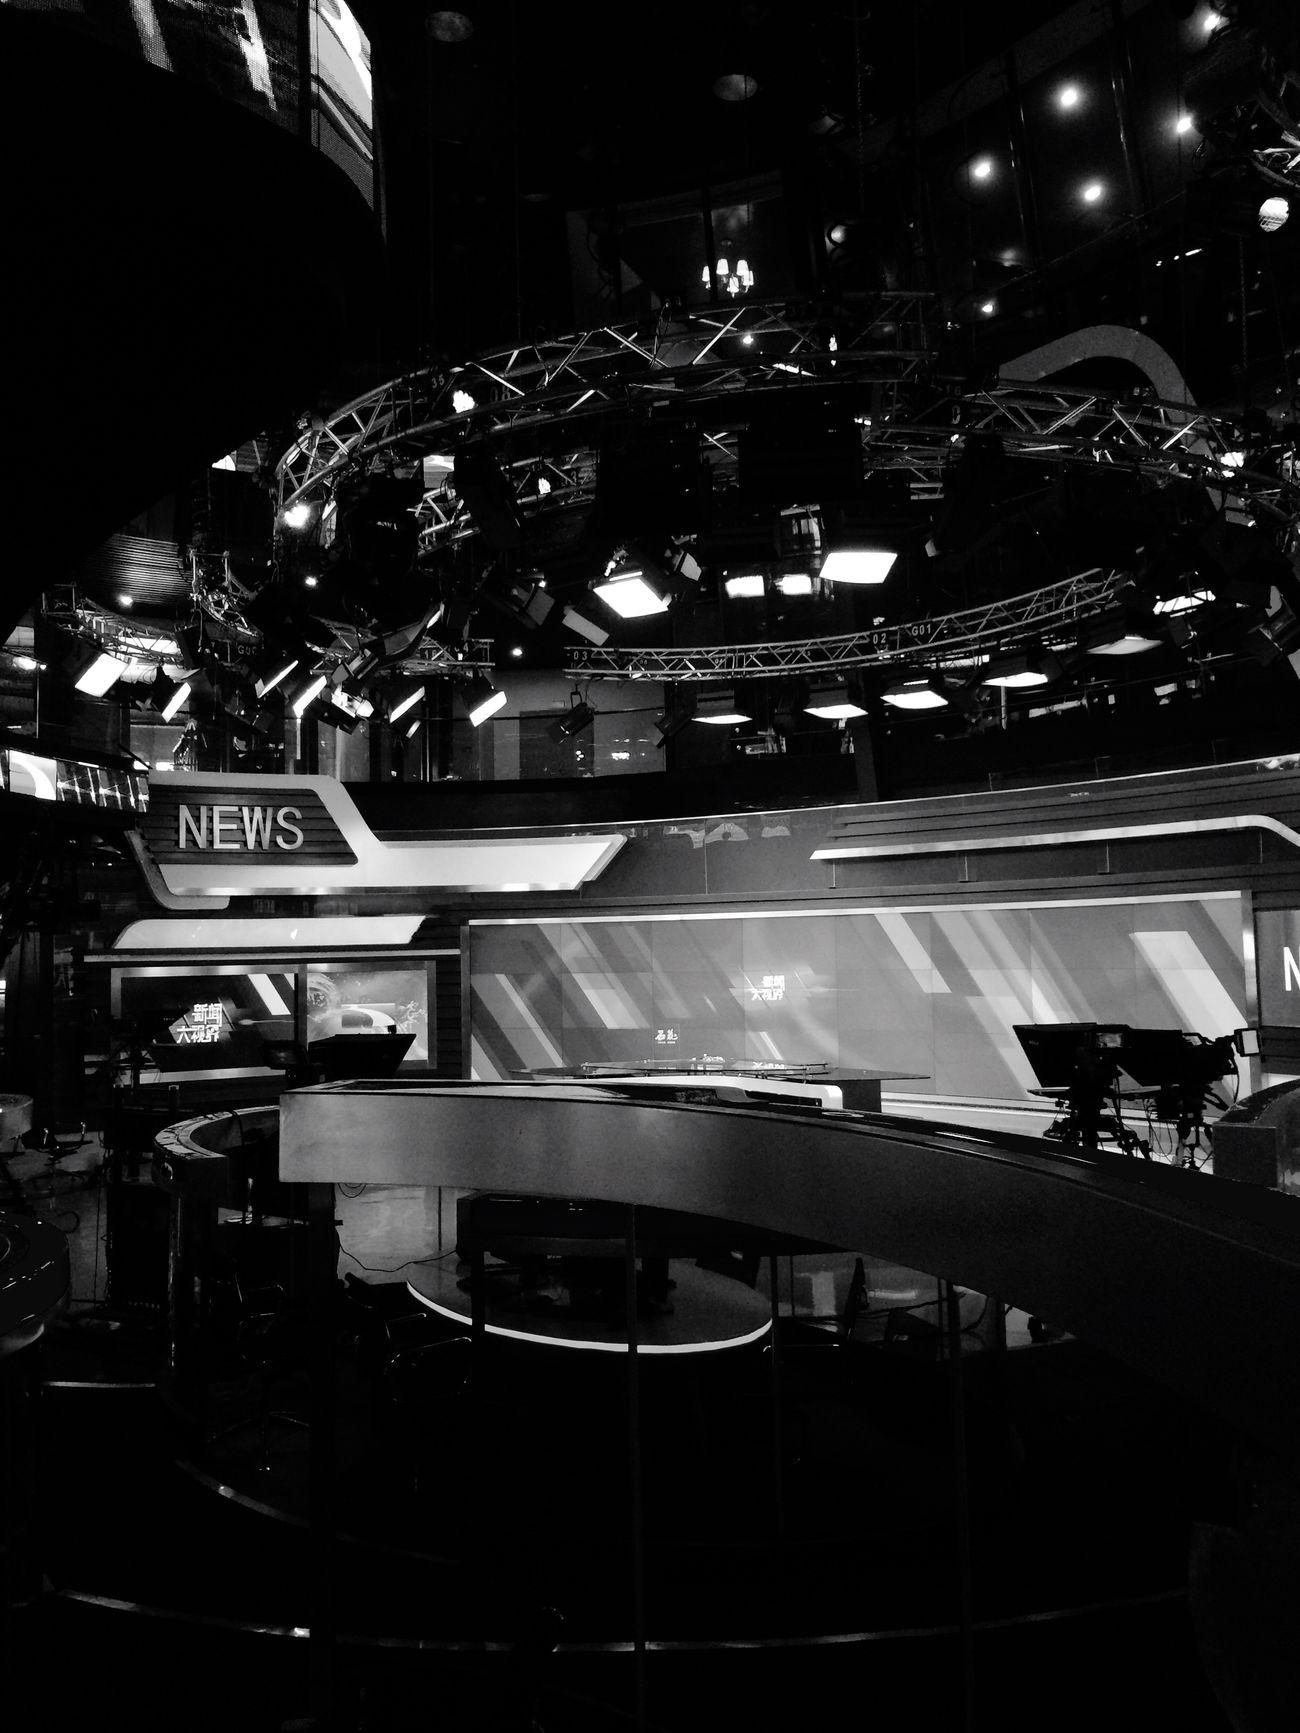 News On TV